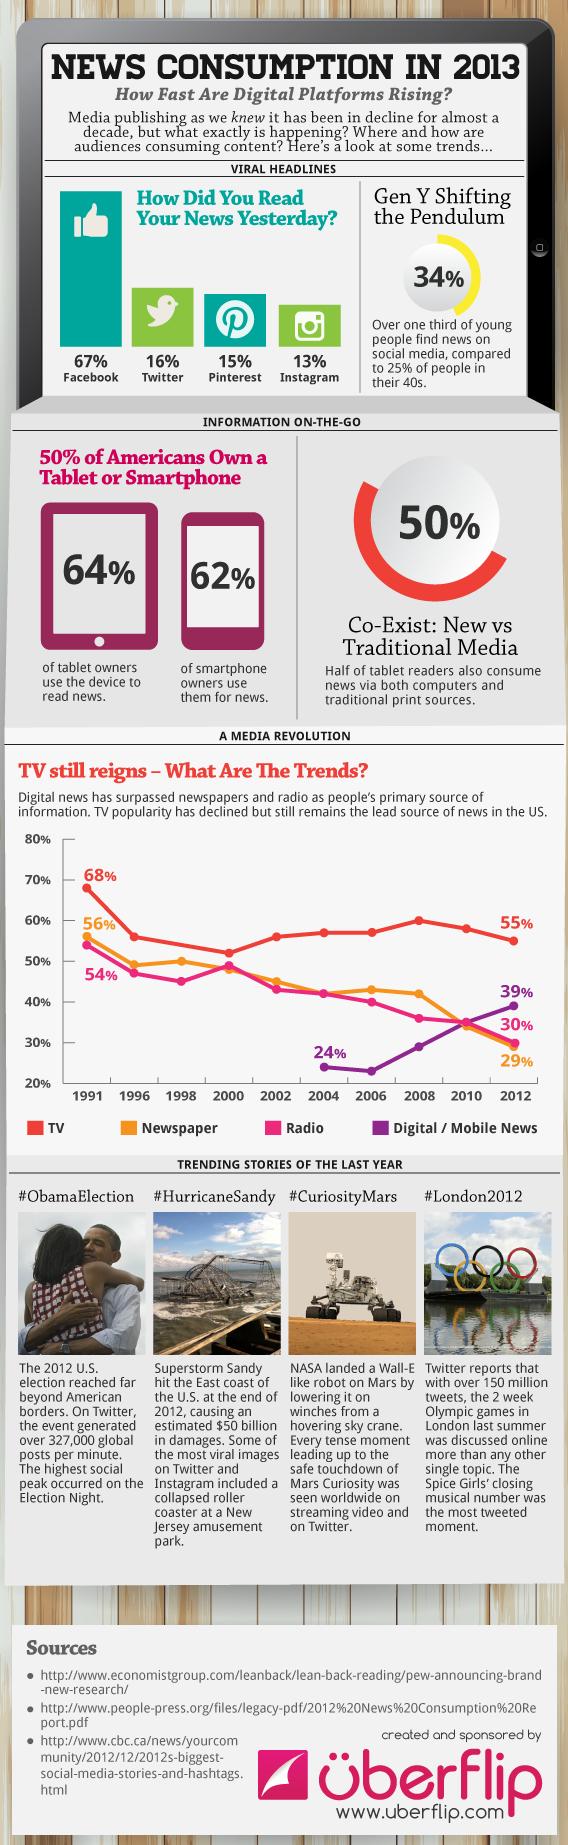 инфографика сми 2012